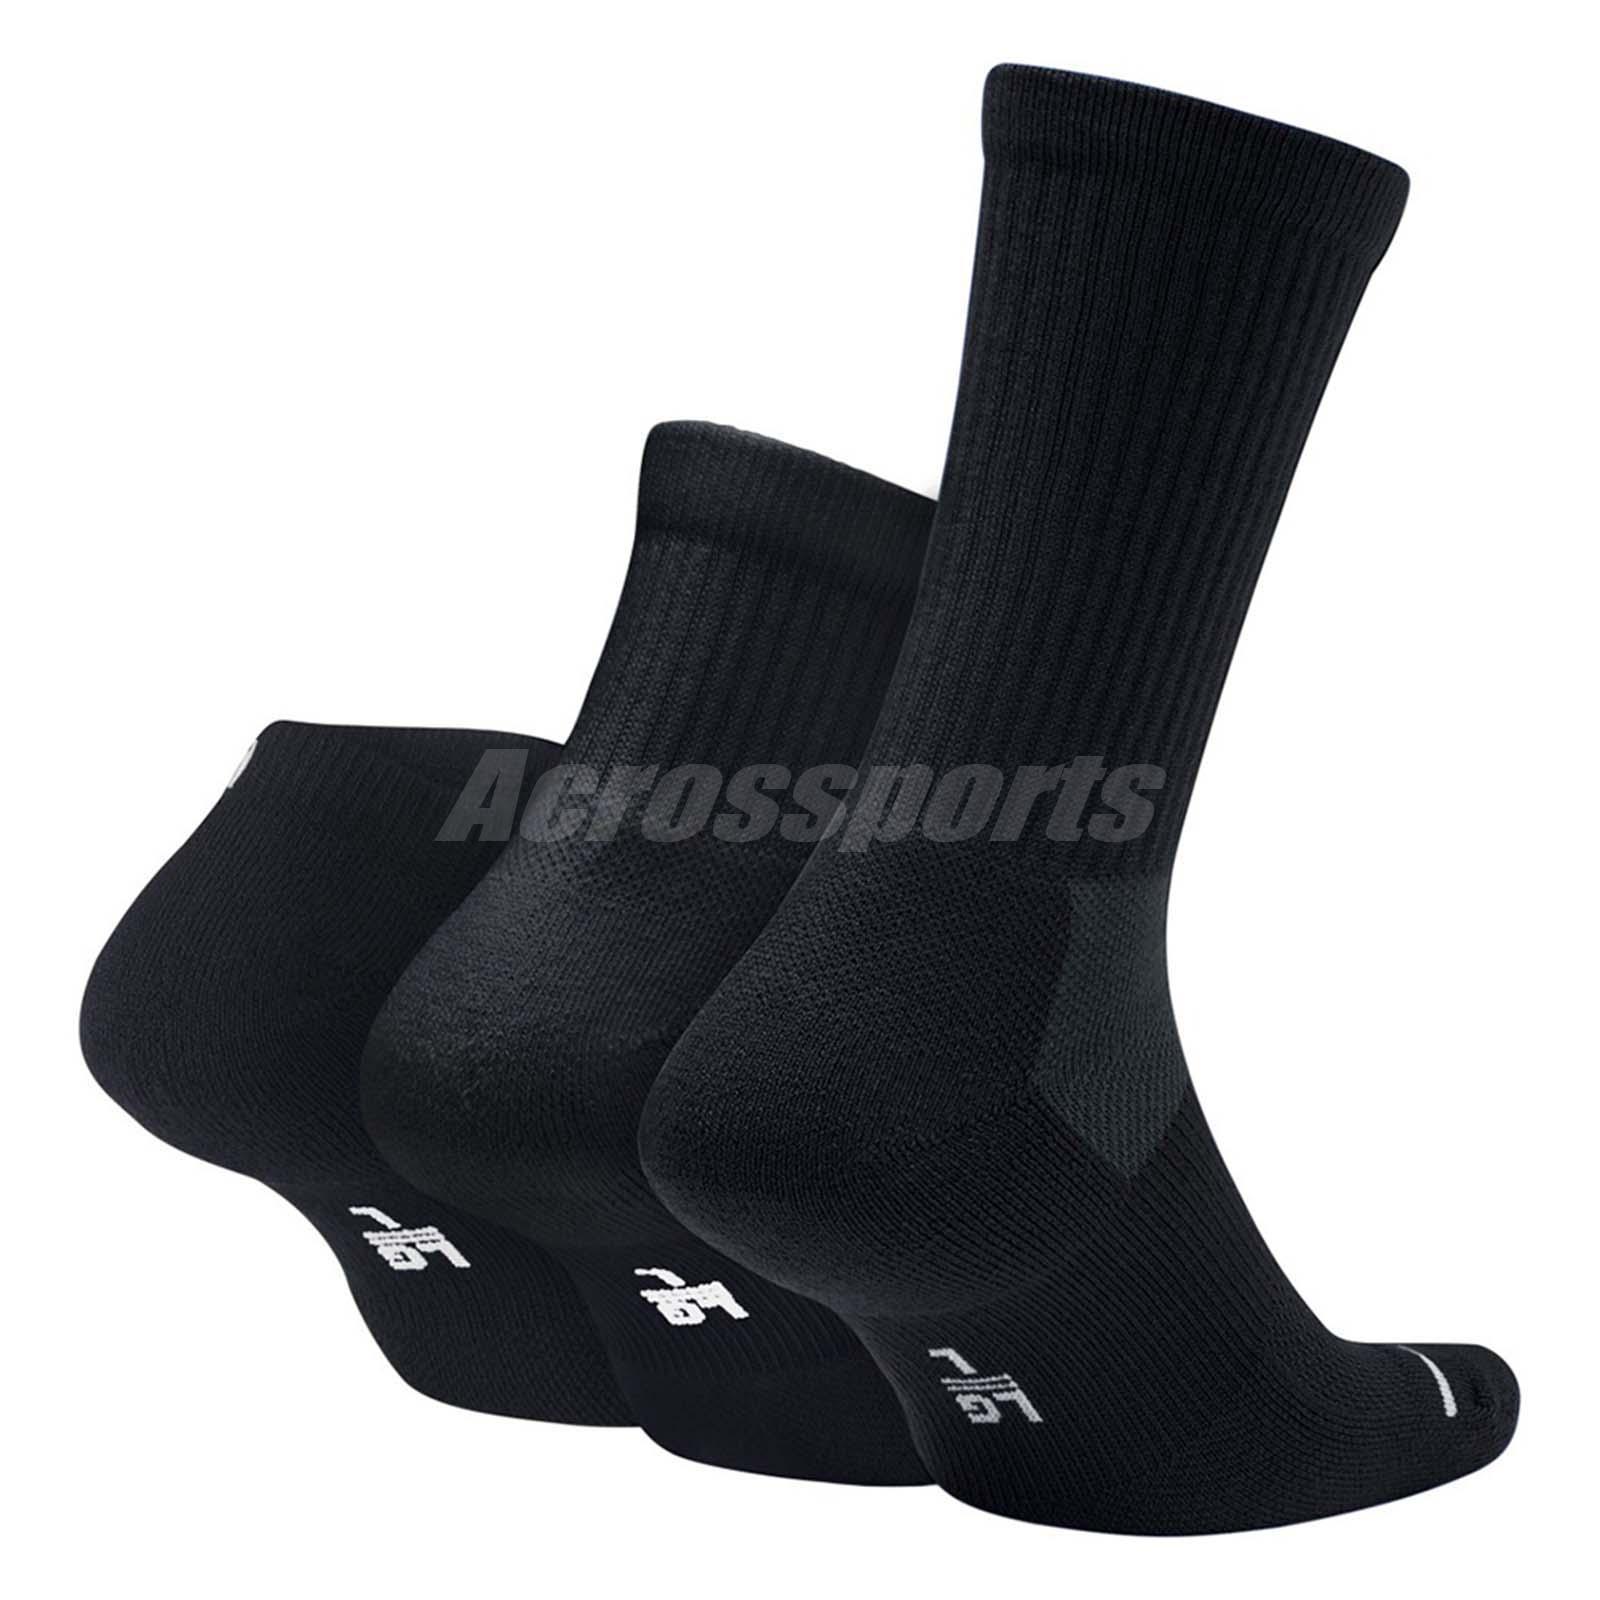 348e190ab664 Nike Air Jordan Everyday Max Waterfall Socks 3 Pairs 1 Pack Gym ...